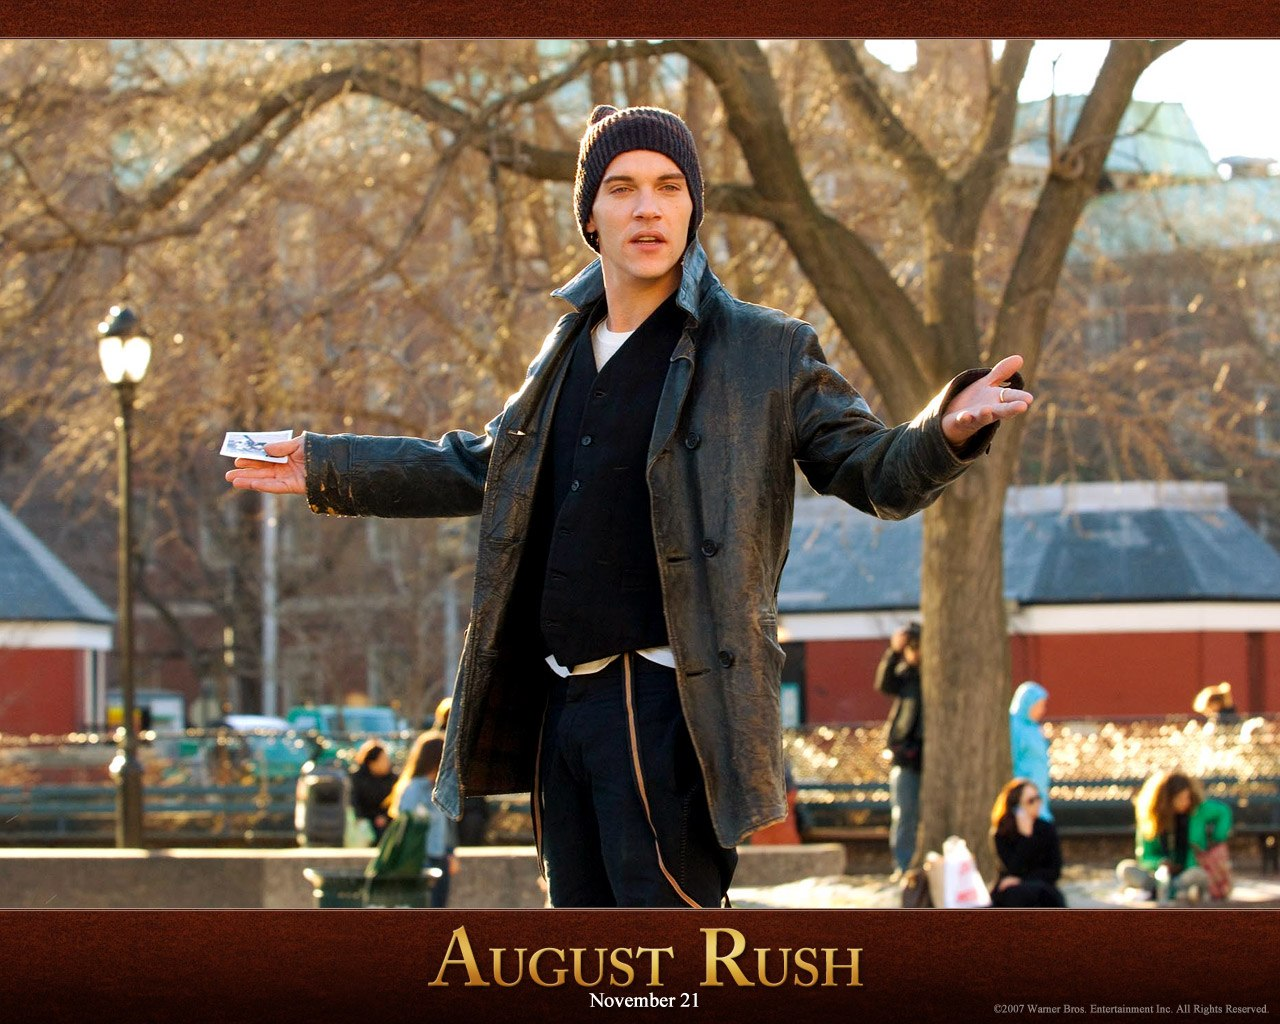 http://3.bp.blogspot.com/_cQqdyHMOFbA/S_gGz7jBJeI/AAAAAAAAAEY/kf8y74_Qd7k/s1600/August-Rush-Jonathan-Rhys-Meyers-1297.jpg